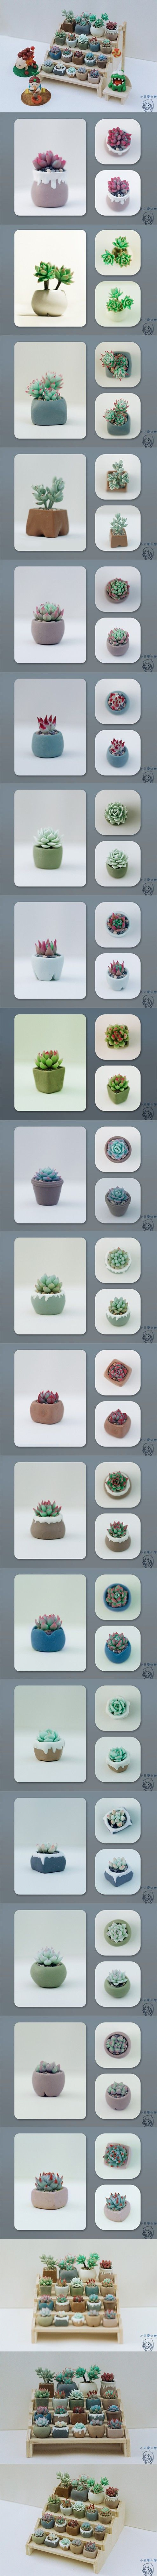 Diferentes clases de cactus.